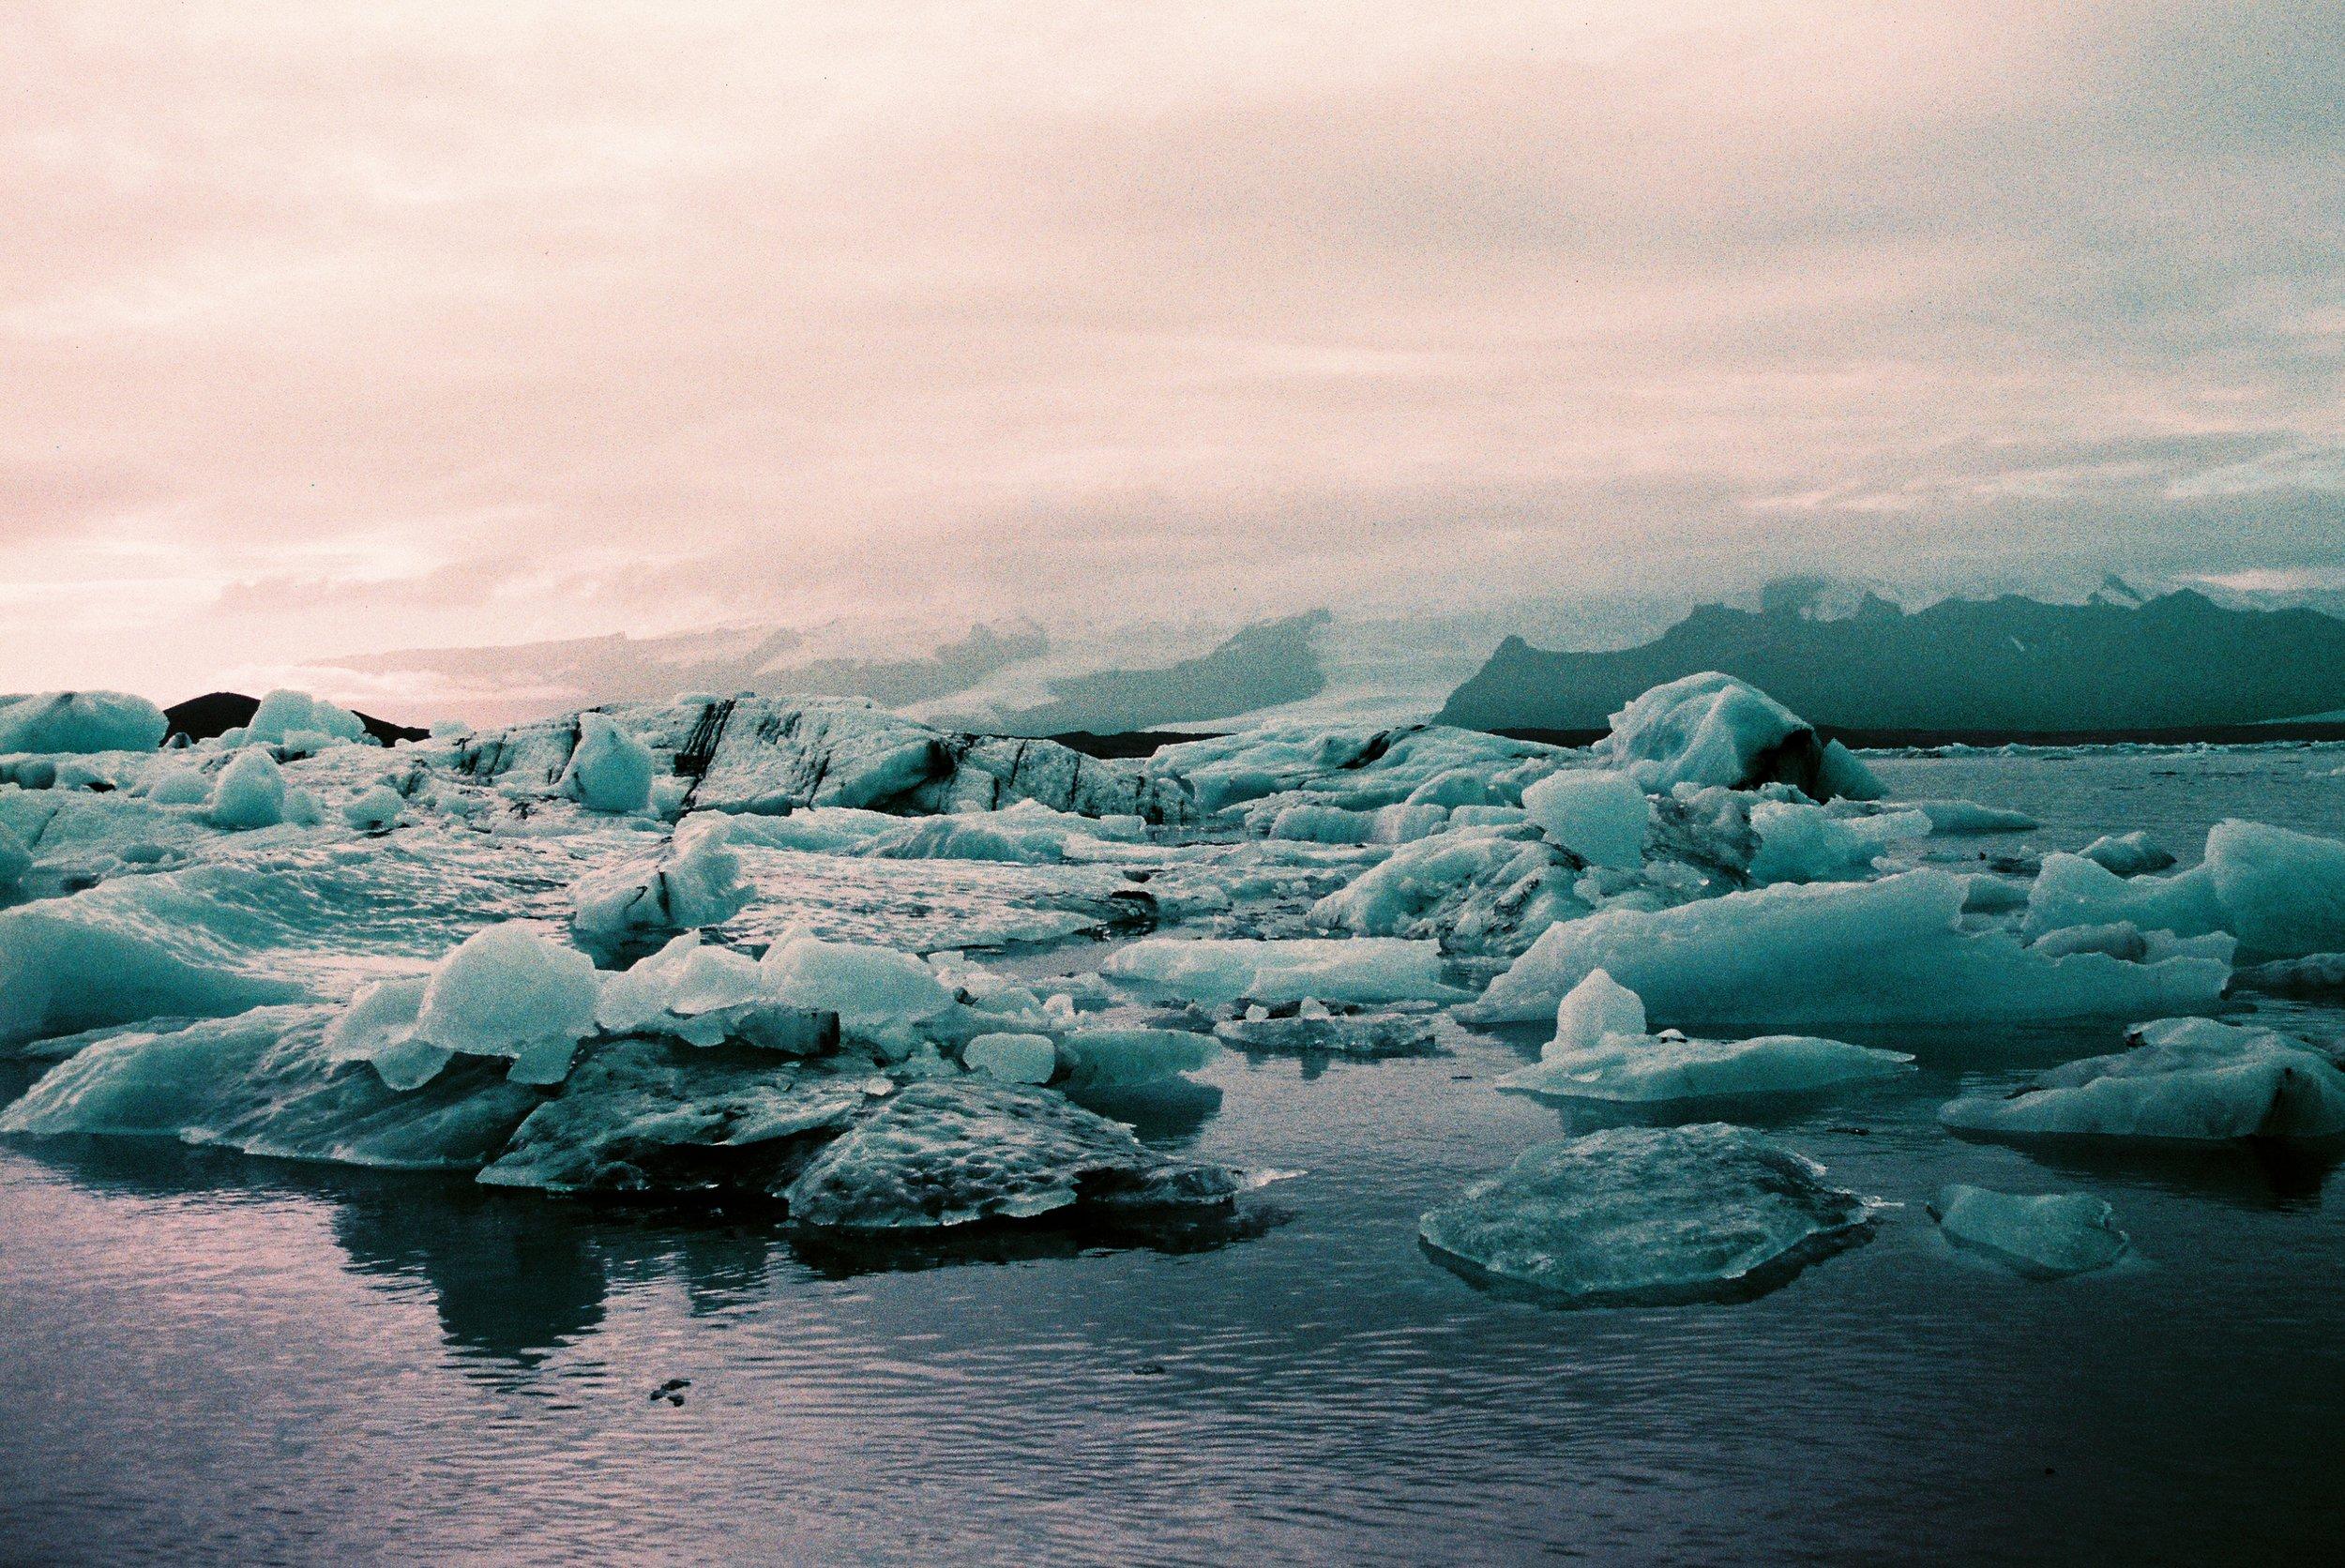 05 - Float On - Jokulsarlon Glacier Lagoon.jpg